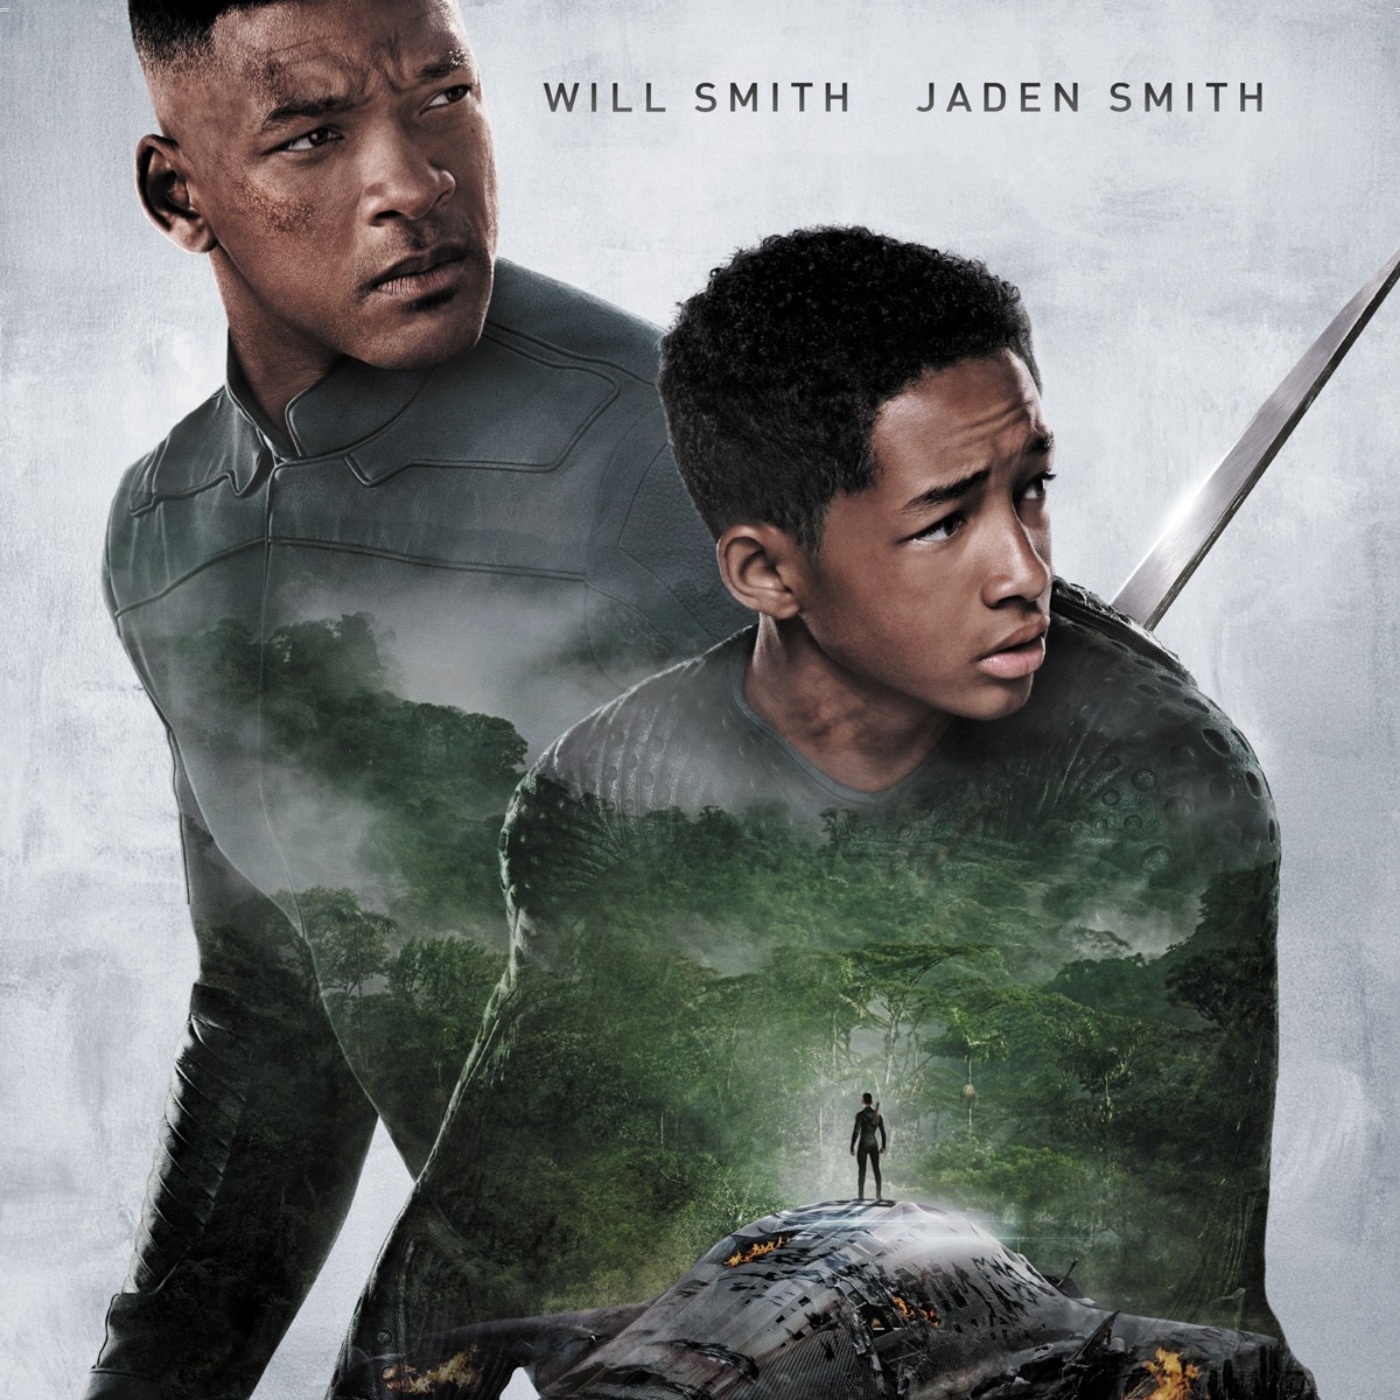 PODCAST CINEMA | Critique du film AFTER EARTH / CinéMaRadio